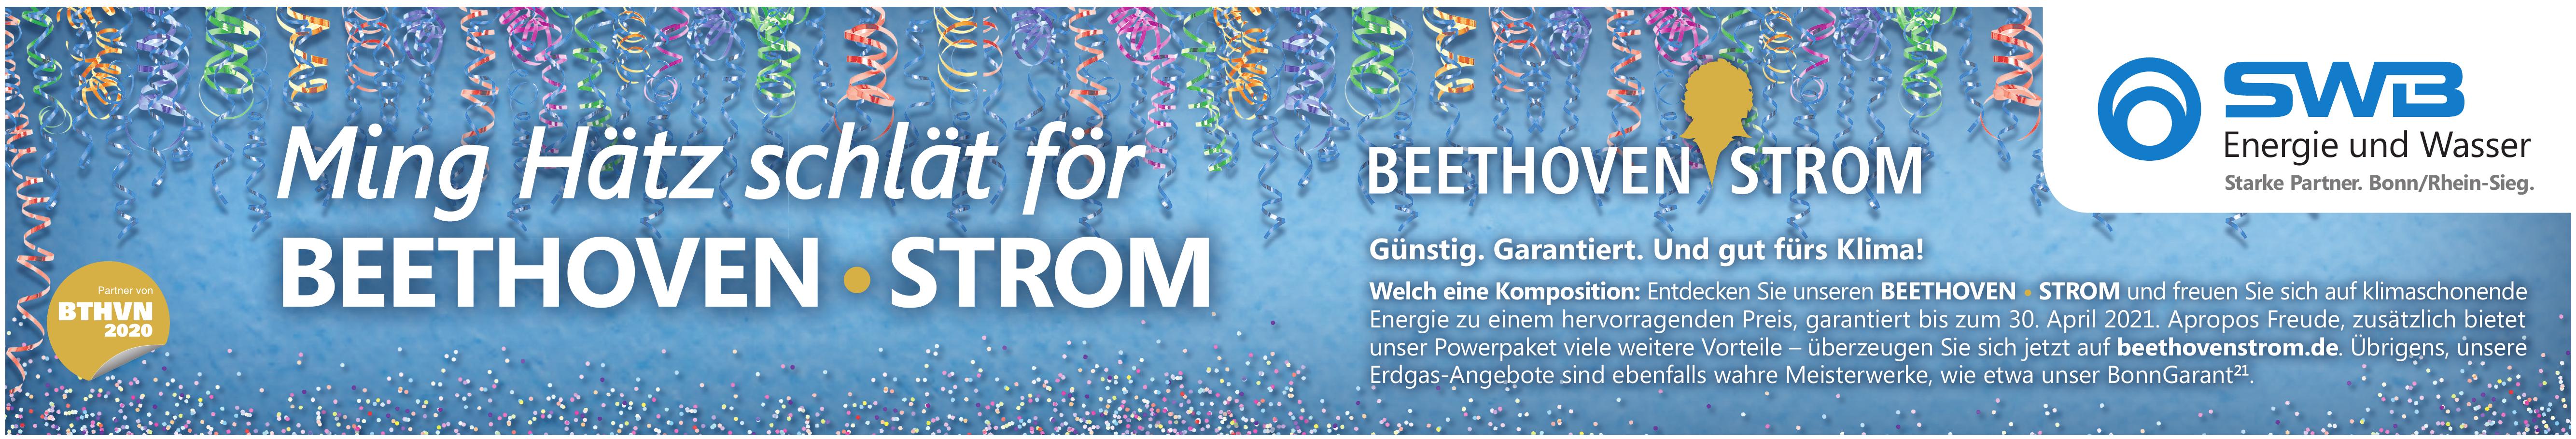 SWB - Beethoven Strom